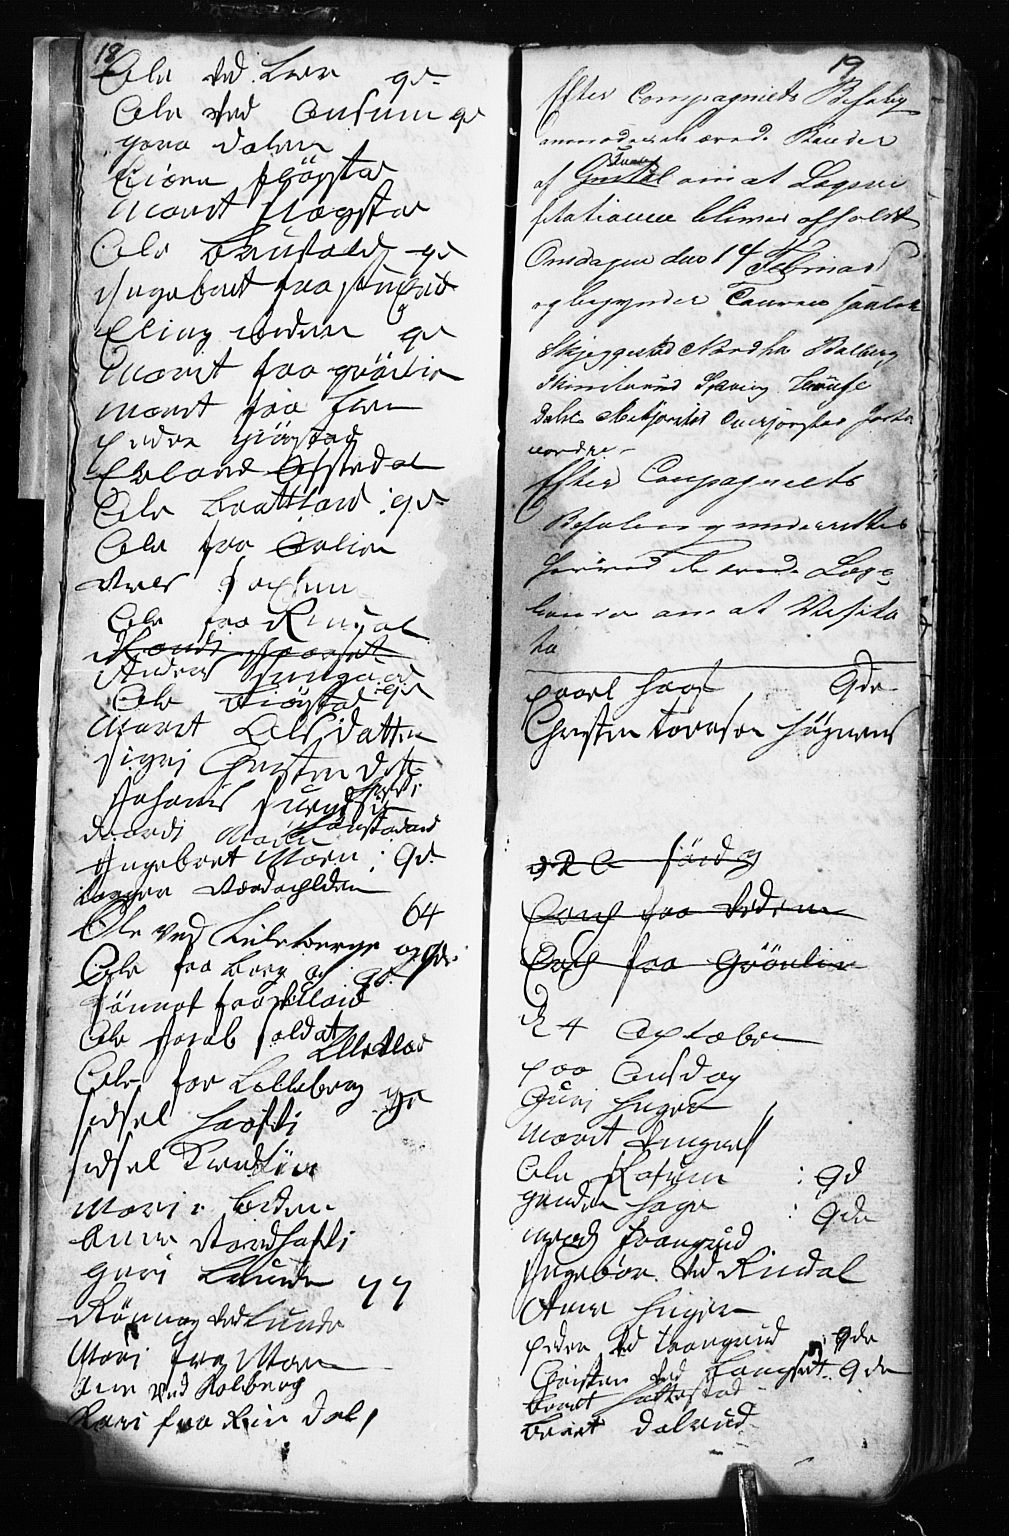 SAH, Fåberg prestekontor, Klokkerbok nr. 2, 1741-1756, s. 18-19